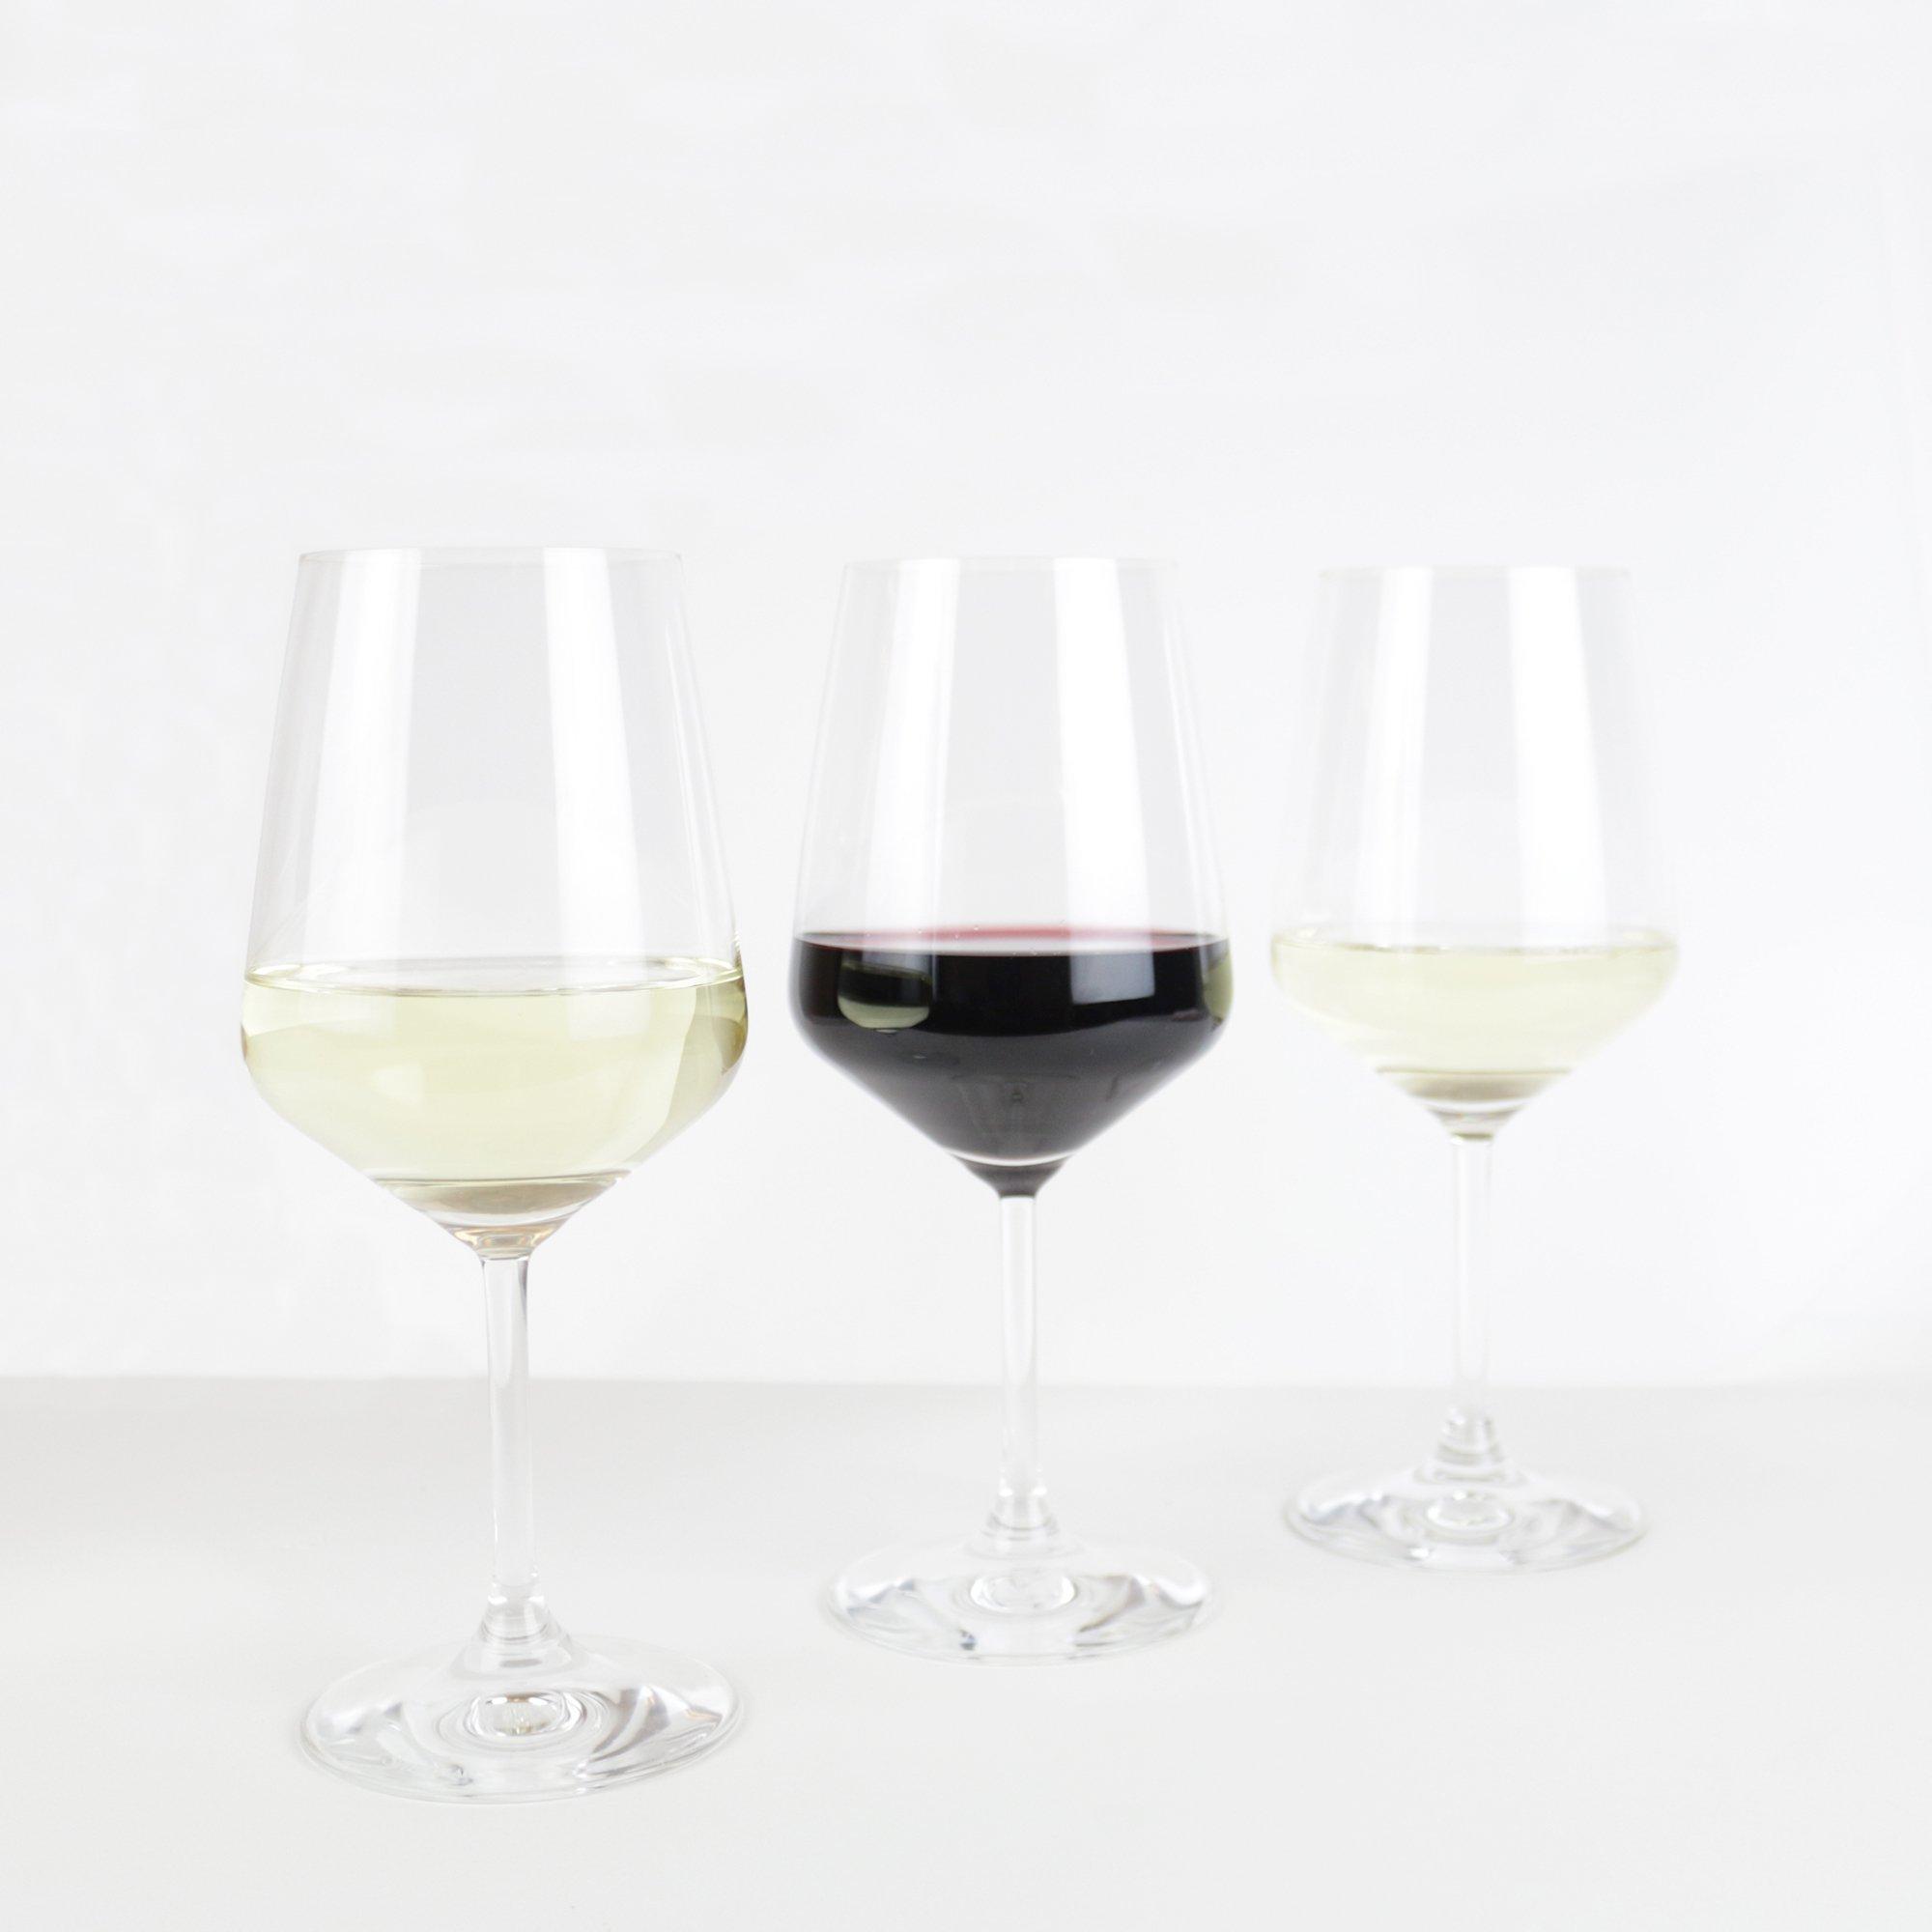 Spiegelau Universal Crystal Wine Glass (Set of 4) - $39